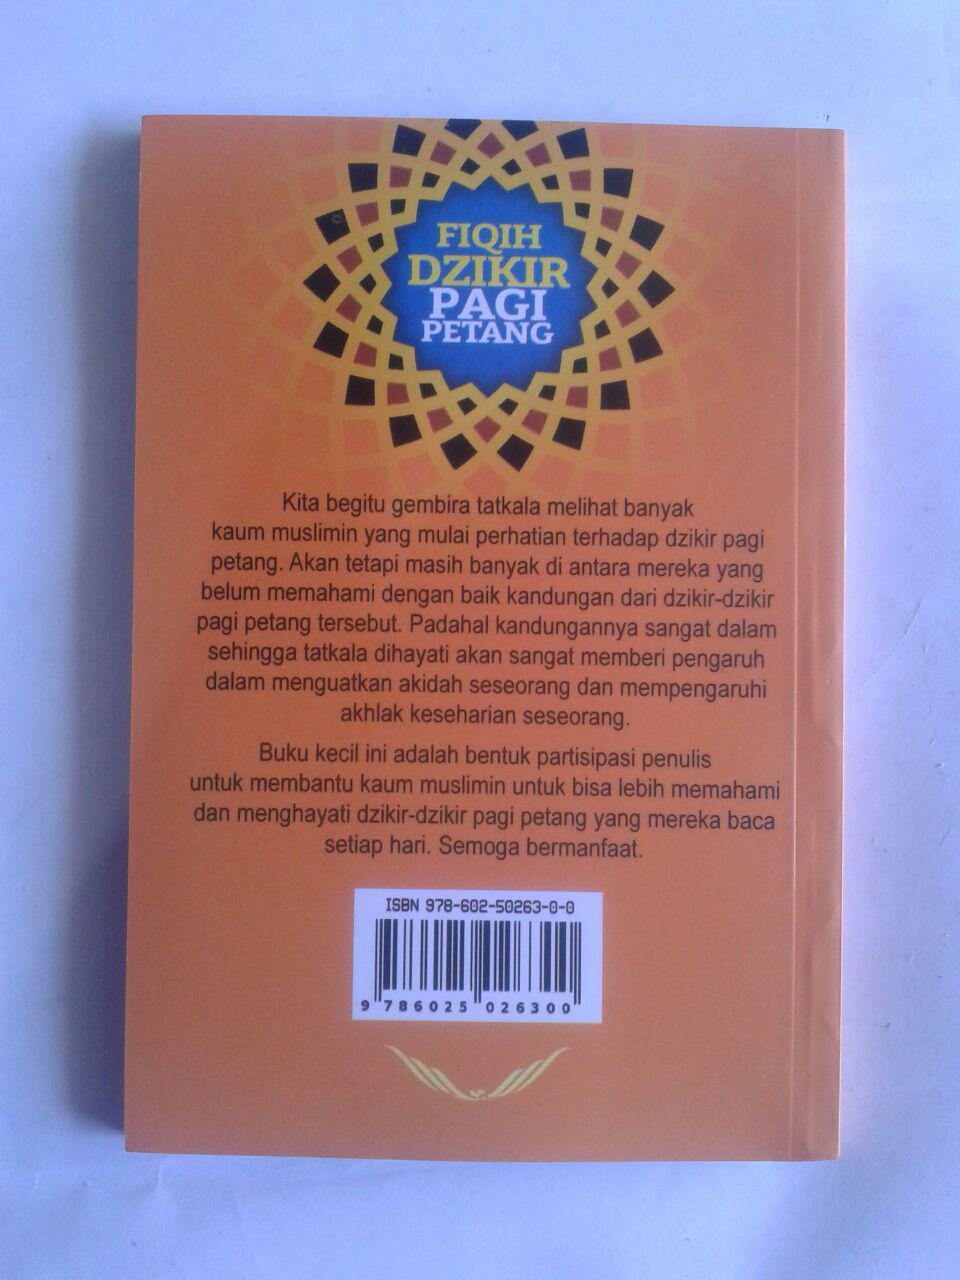 Buku Fiqih Dzikir Pagi Petang cover